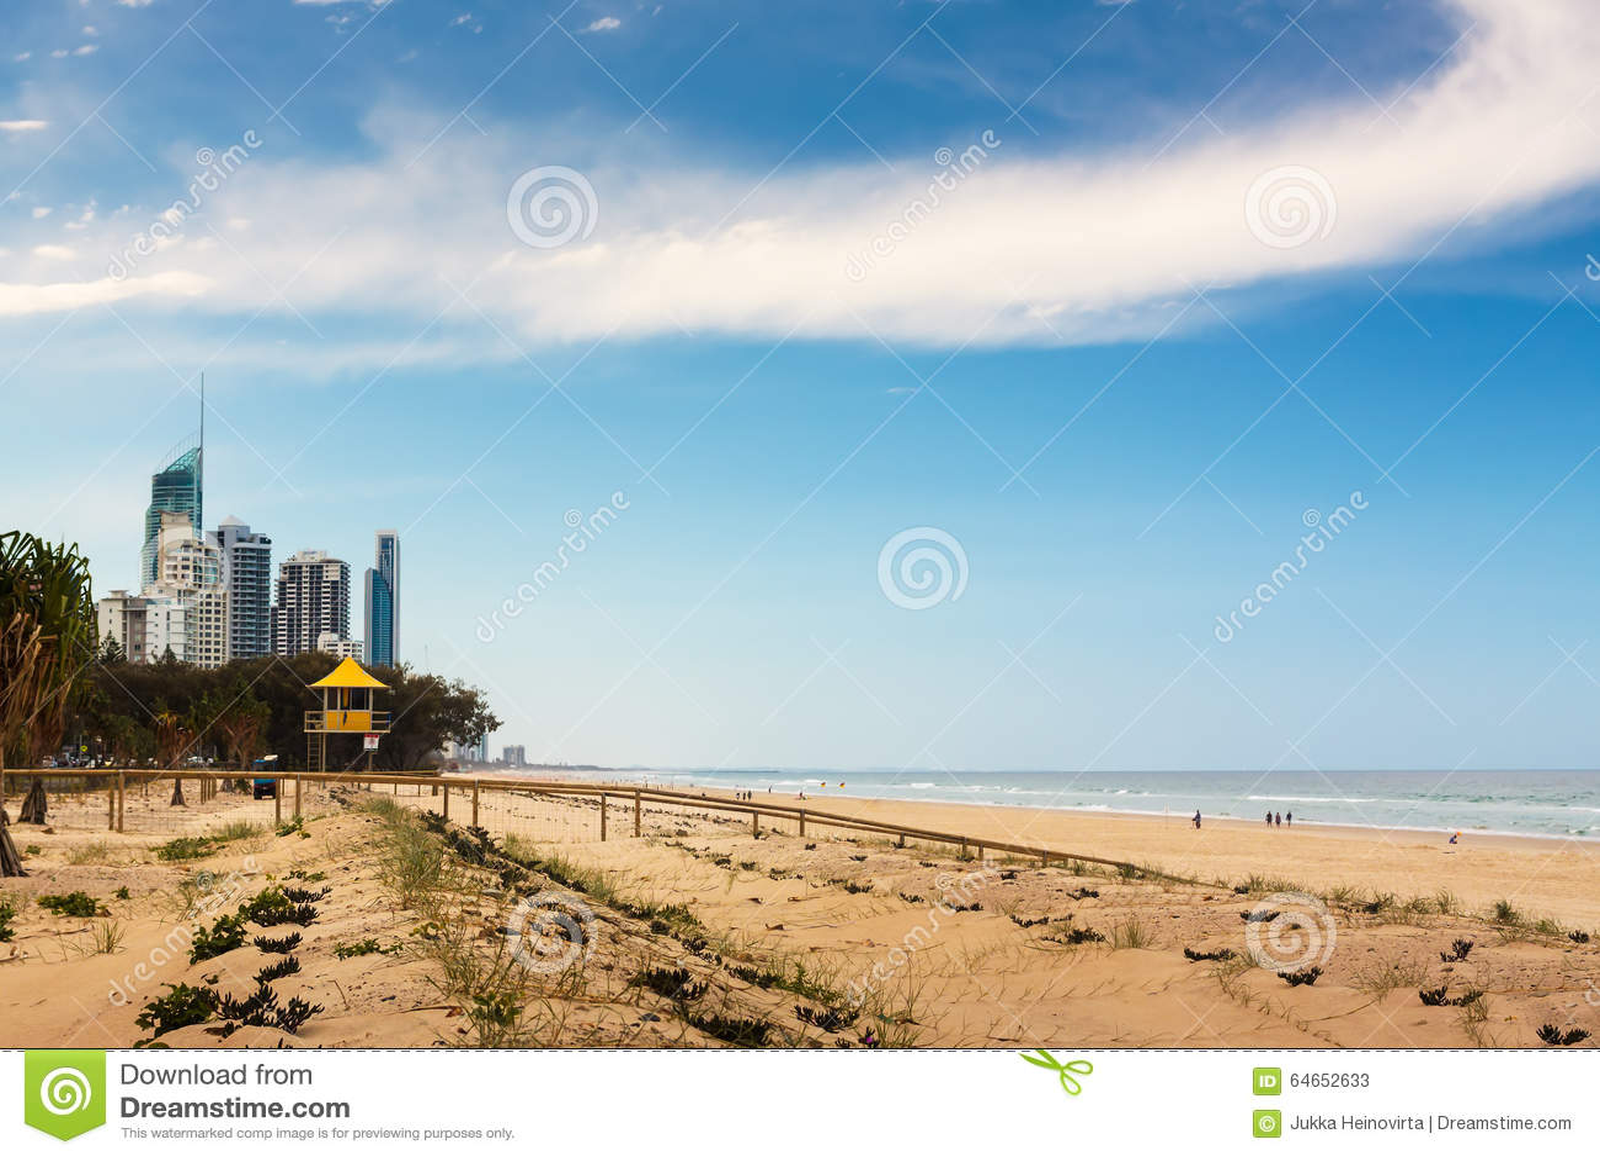 Leibwächter Hut At The Gold Coast